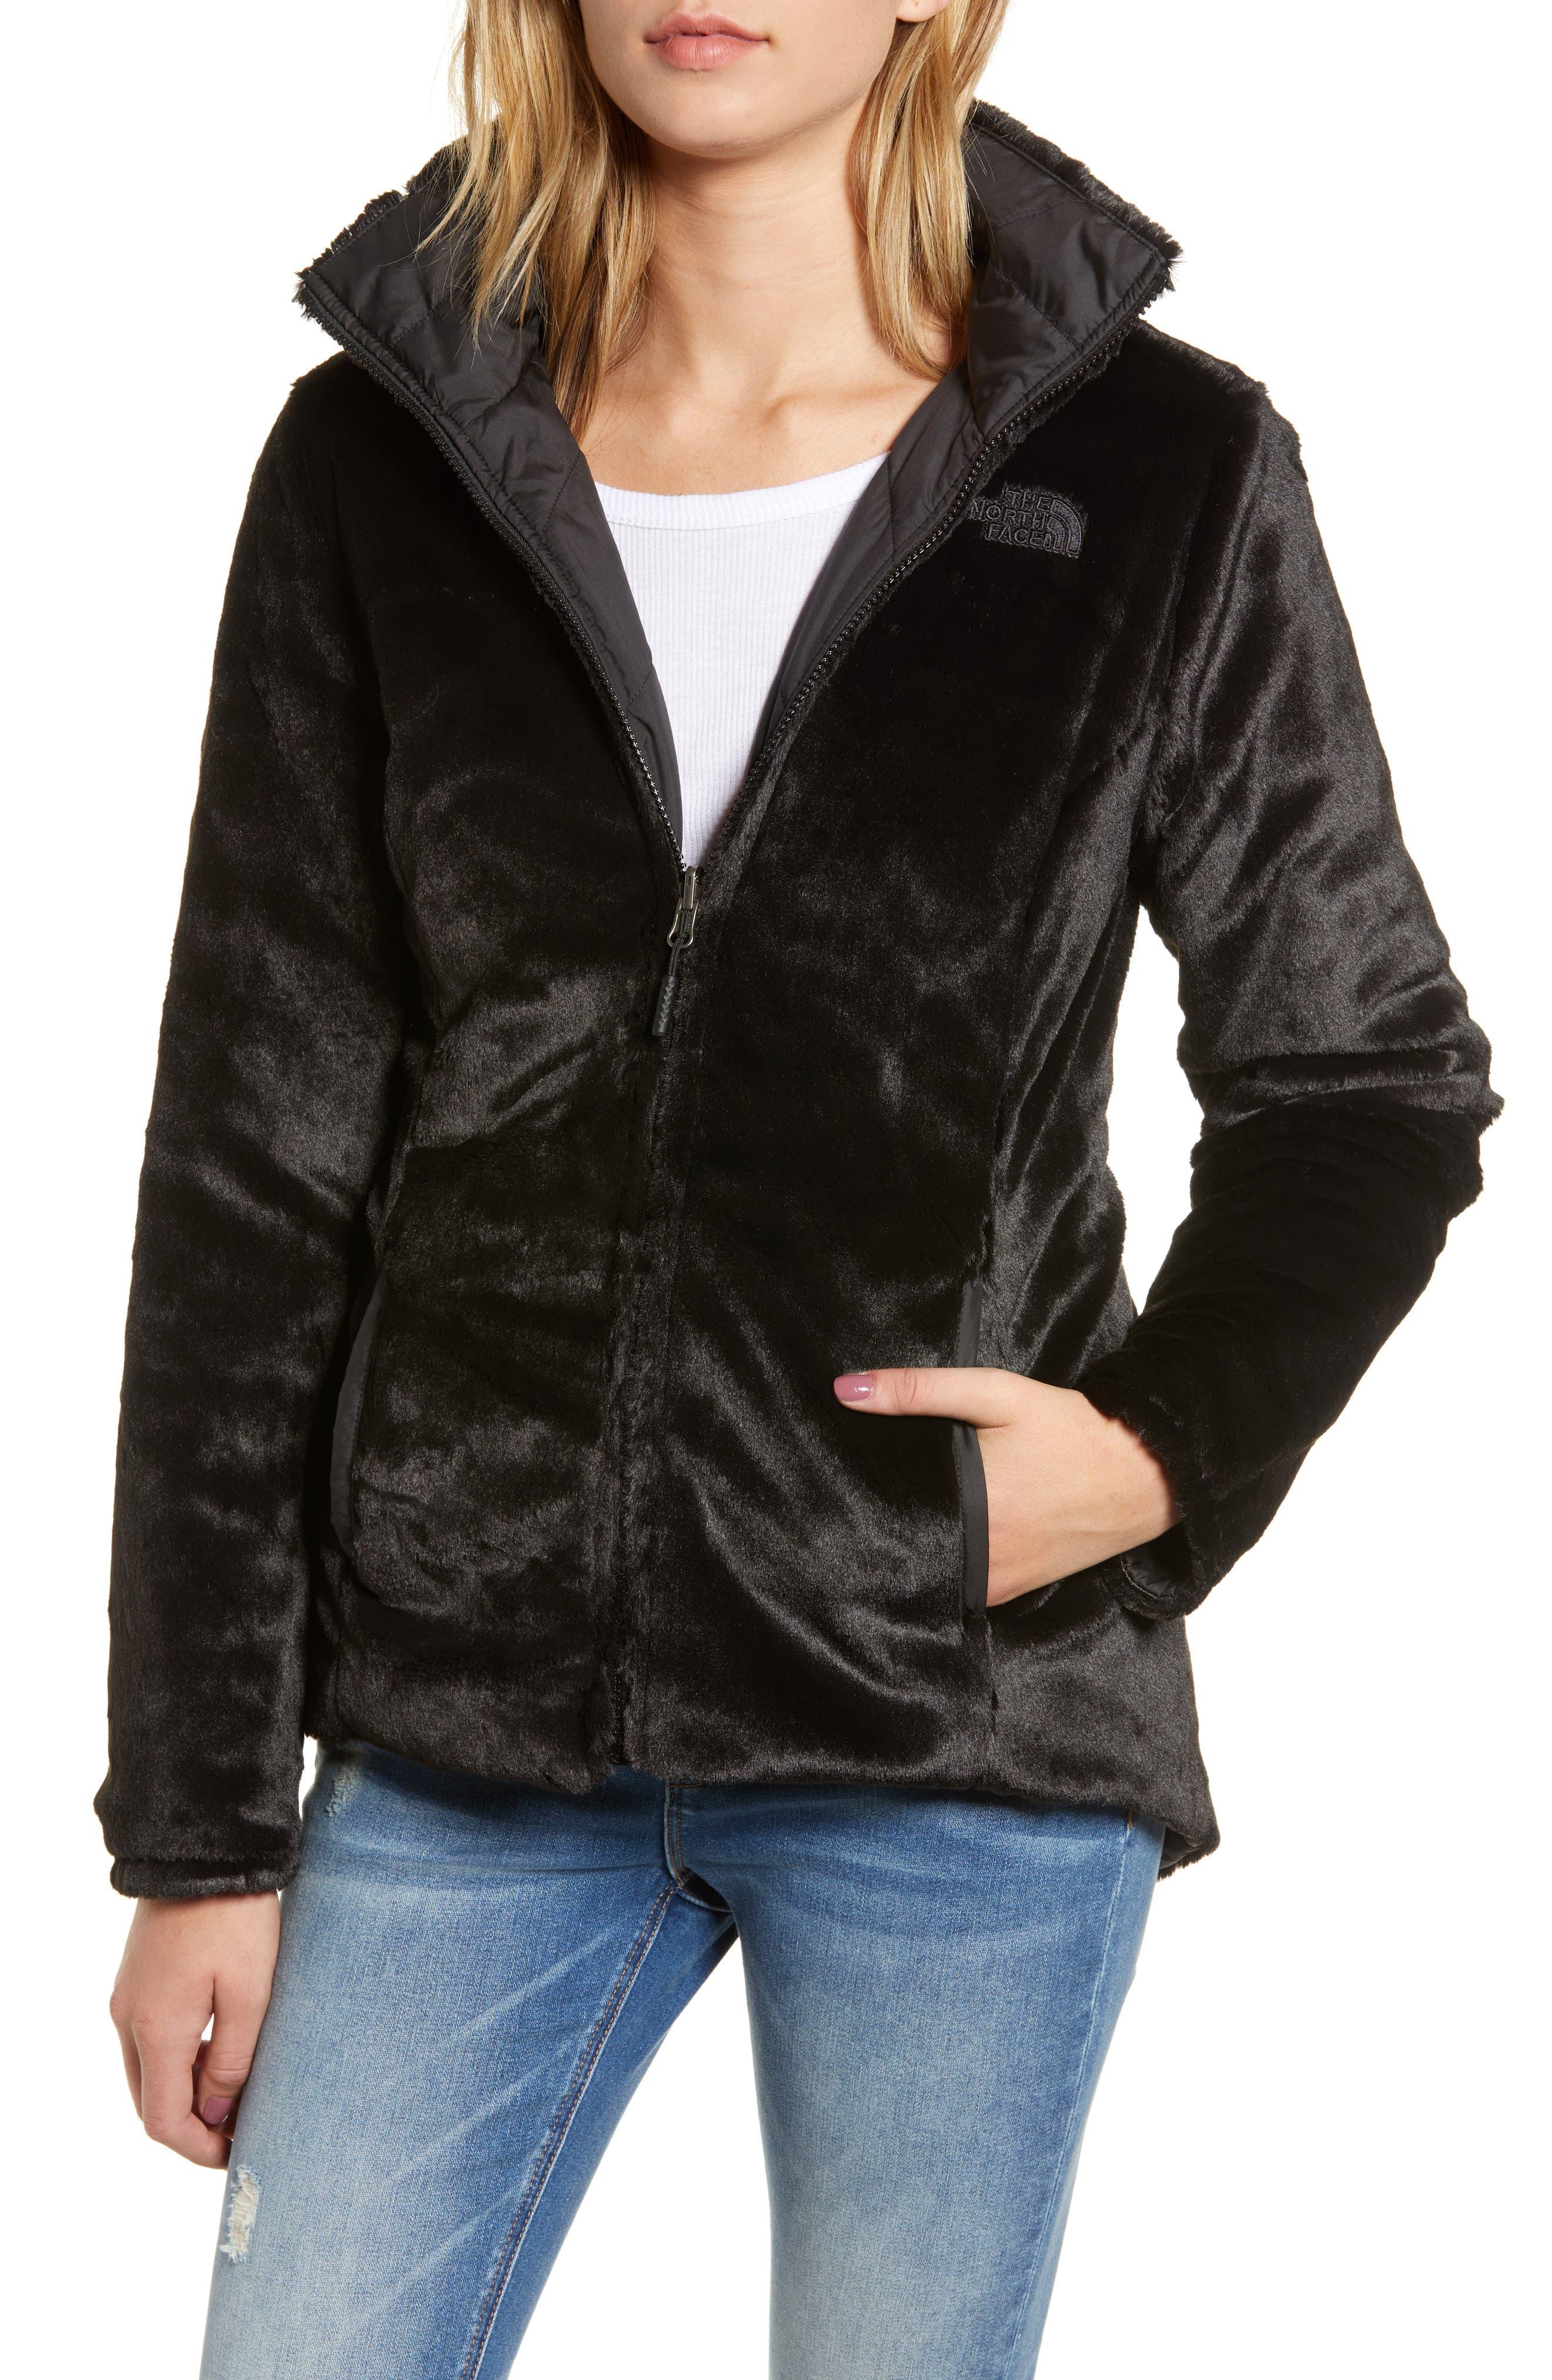 THE NORTH FACE, Mossbud Reversible Heatseeker<sup>™</sup> Wind Resistant Jacket, Alternate thumbnail 5, color, TNF BLACK